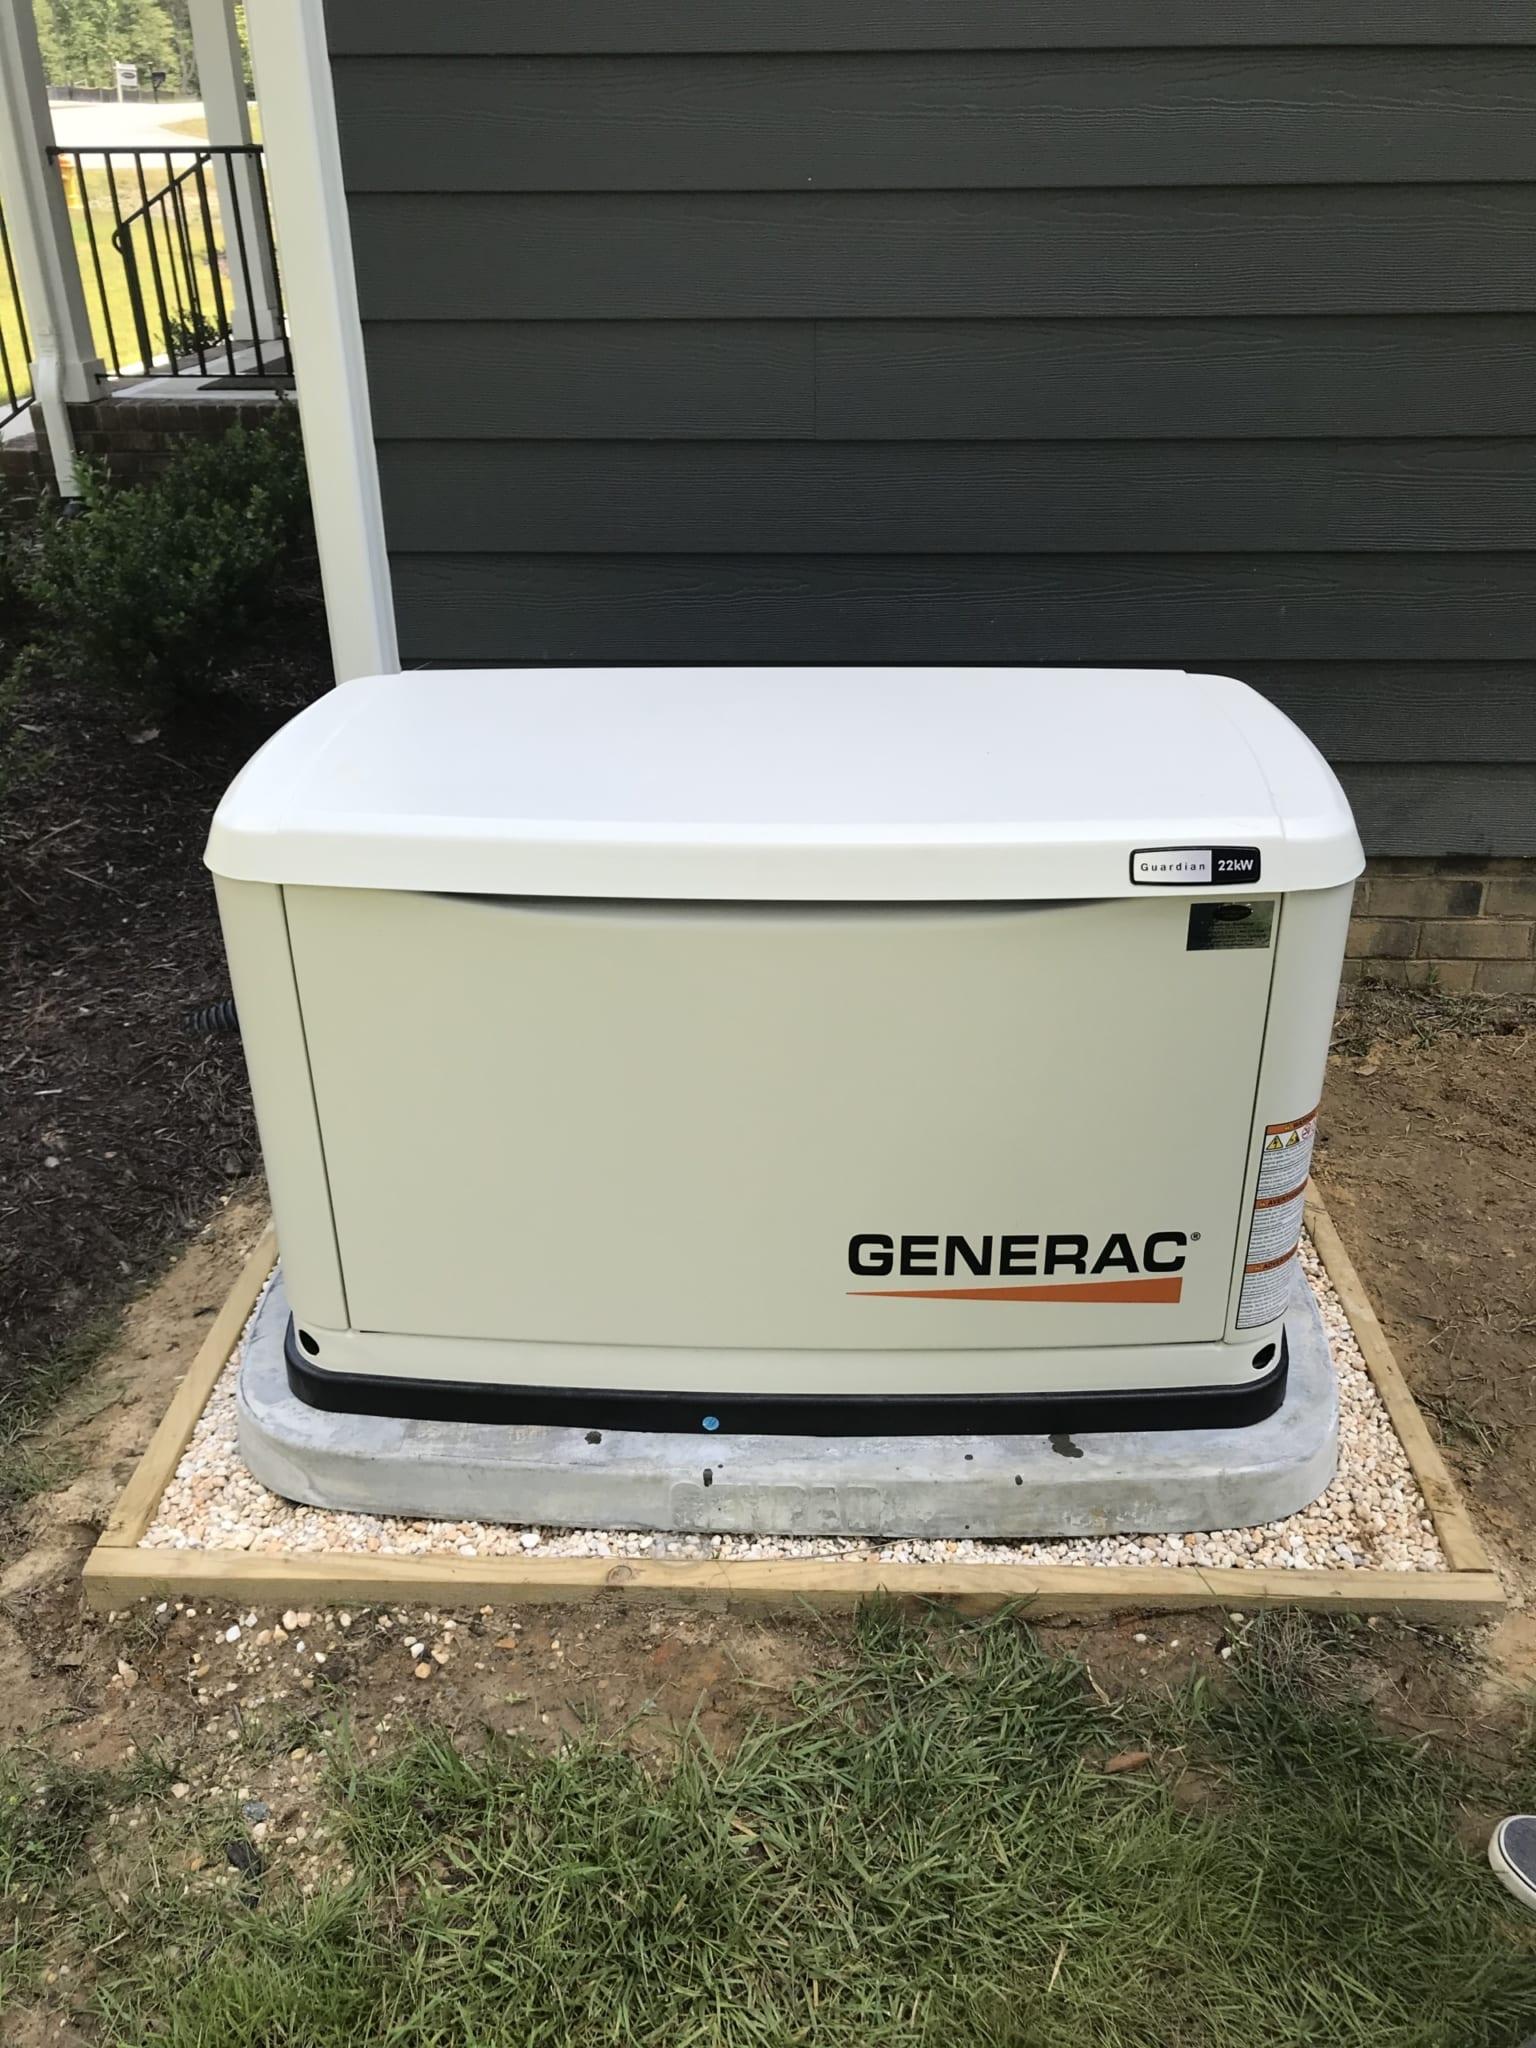 6.19.20 New Kent Generac Automatic Standby Generator